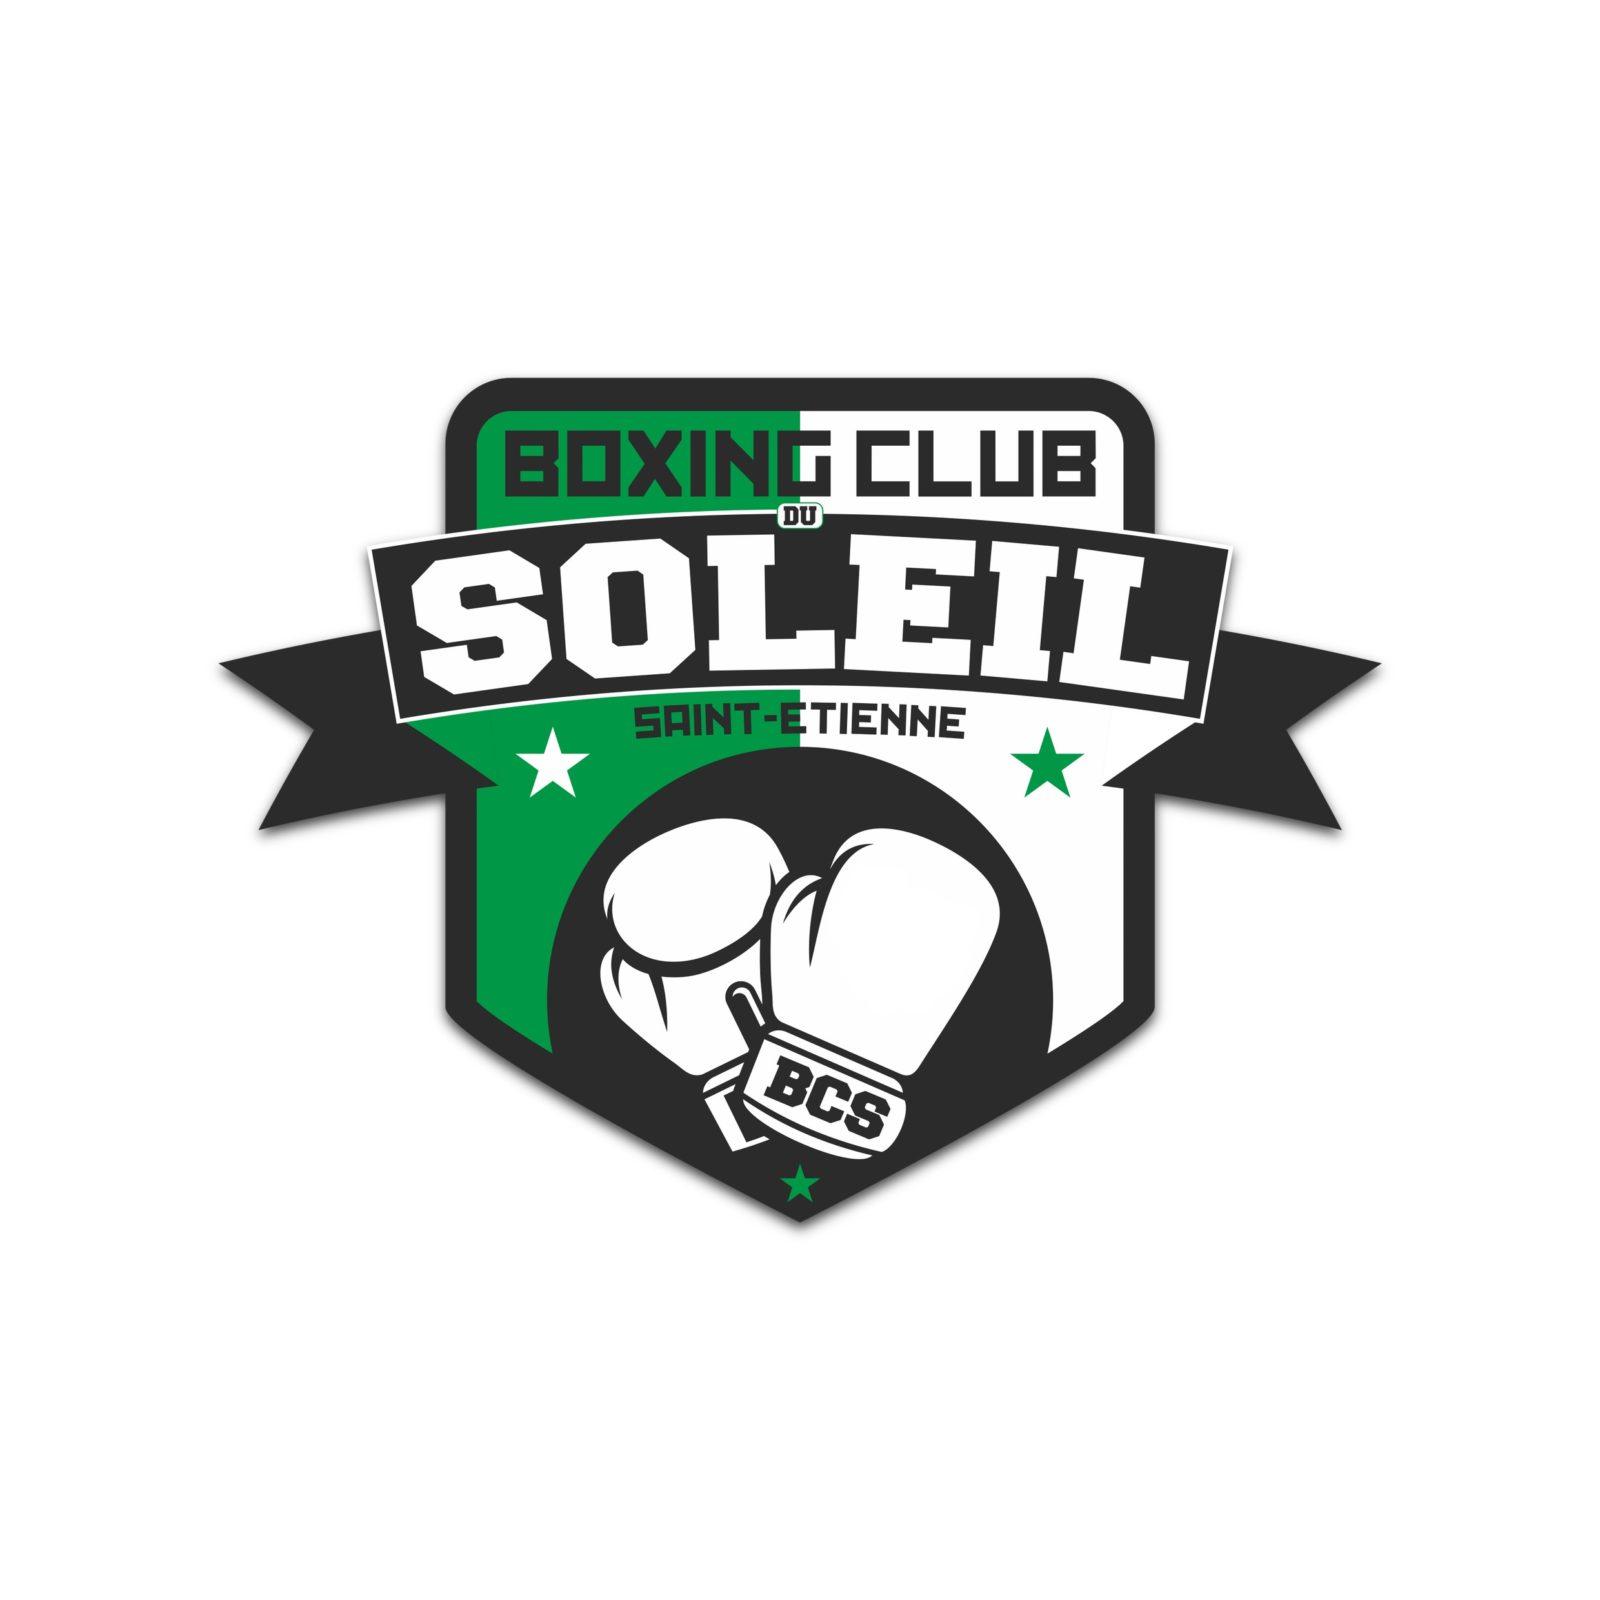 Boxing Club du Soleil